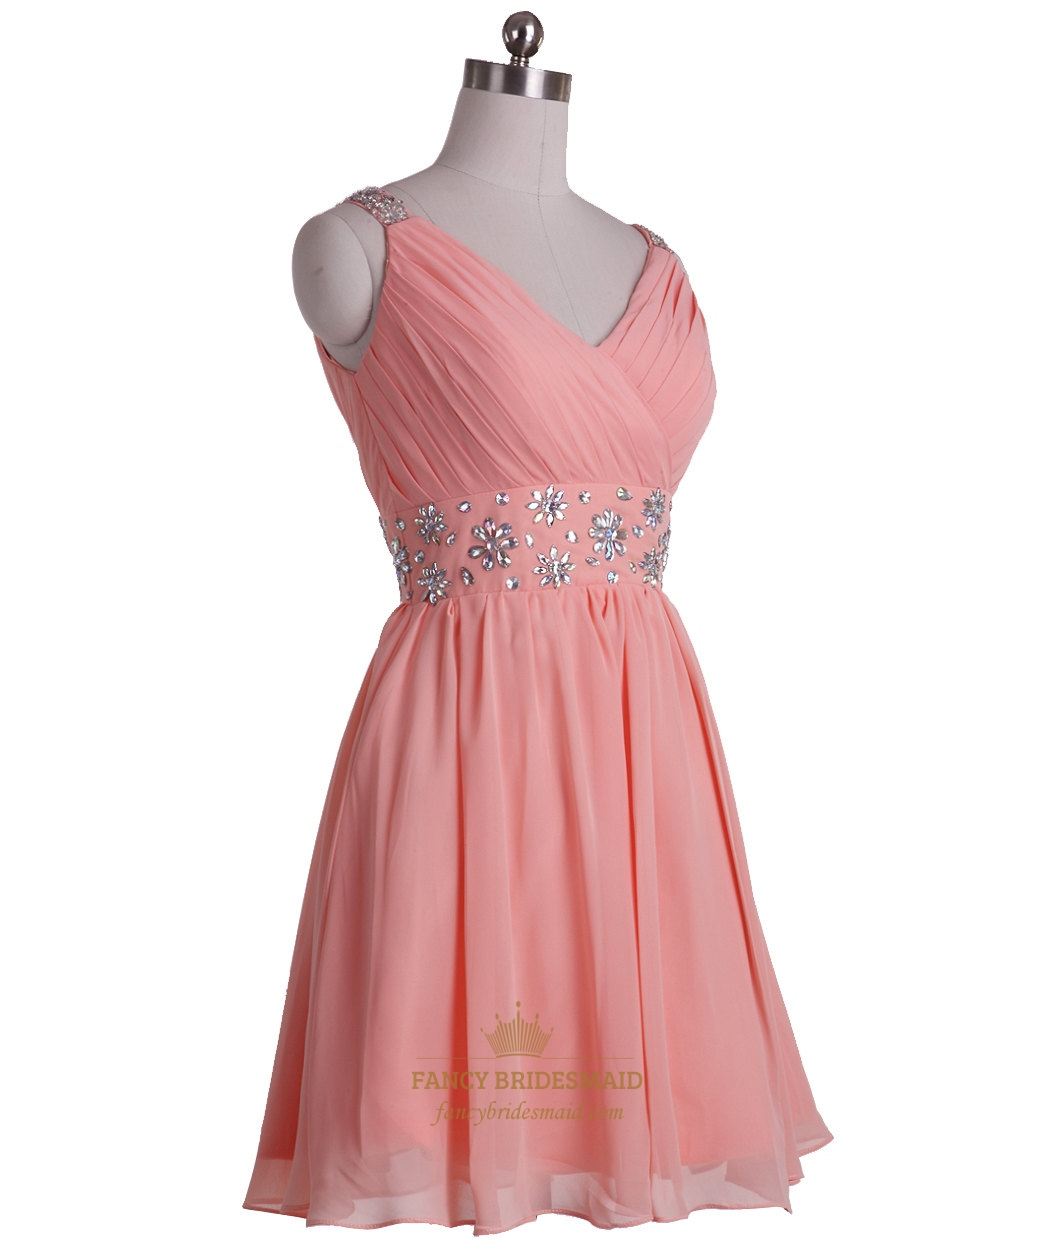 5fa426cacb6b34 Coral A-Line V-Neck Knee-Length Chiffon Cocktail Dress With Beaded Waist  SKU -NW609